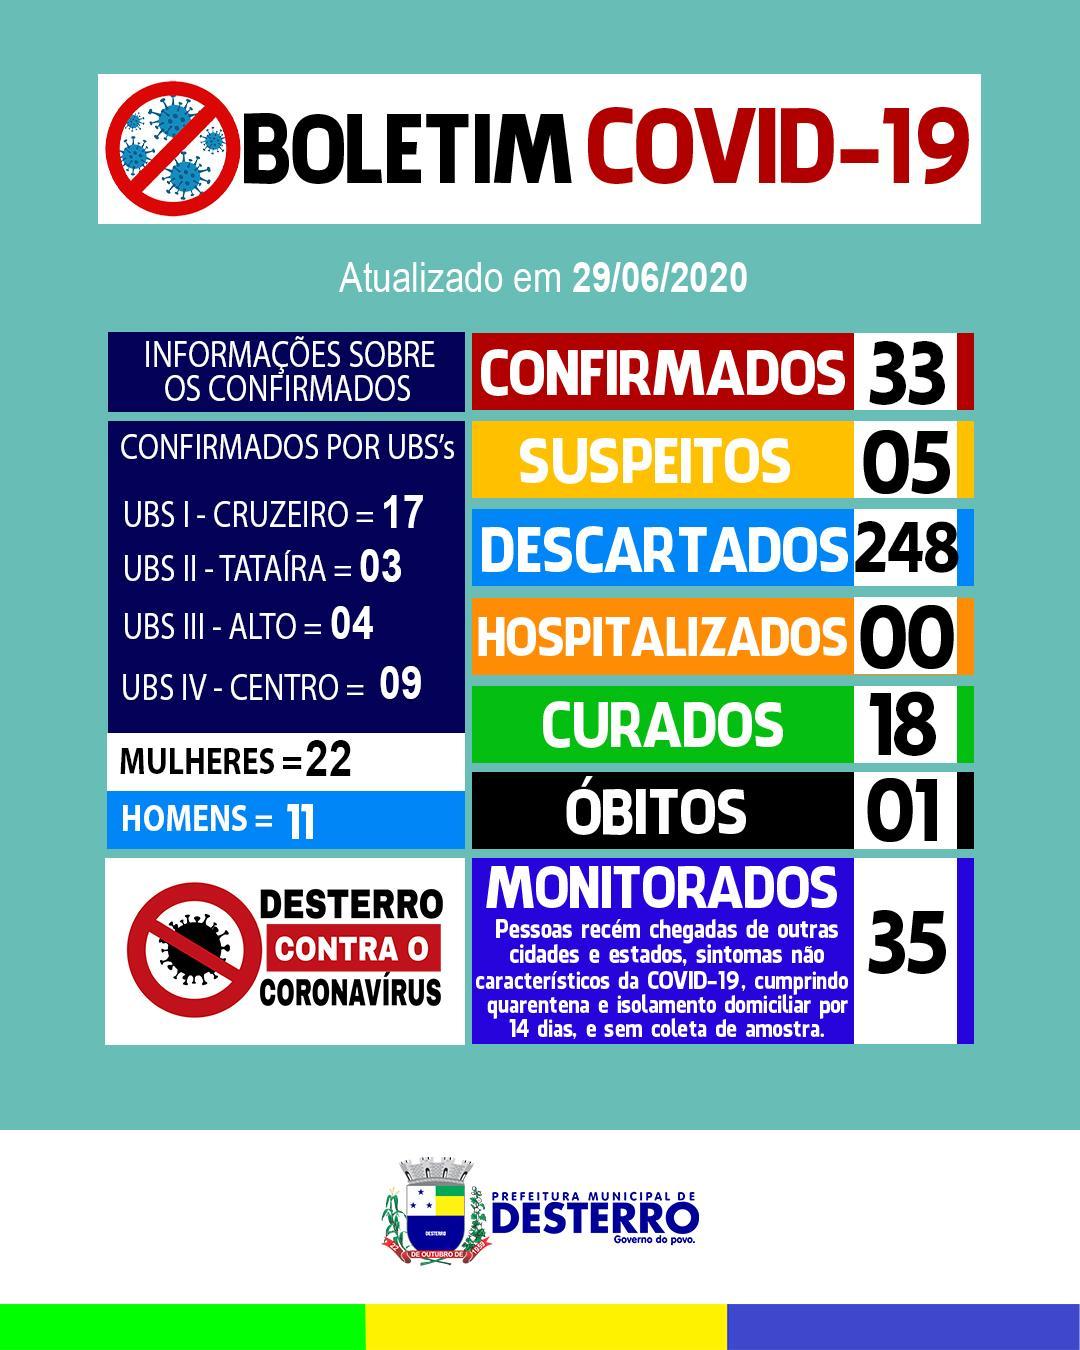 Boletim Covid-19 (29/06/2020)